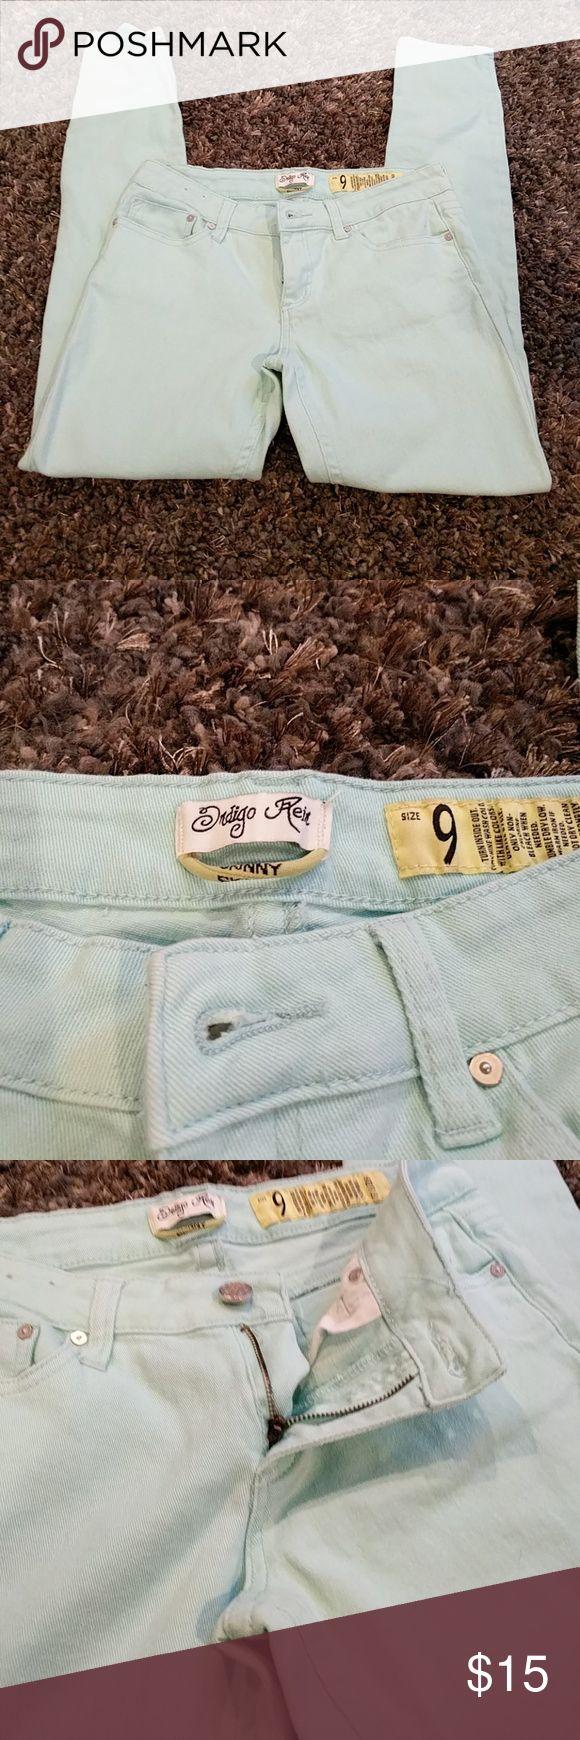 Indigo Rein Mint Green Jeans Size 9 Indigo Rein Mint Green Jeans Size 9, stretchy, skinny jeans. Indigo Rein Jeans Skinny